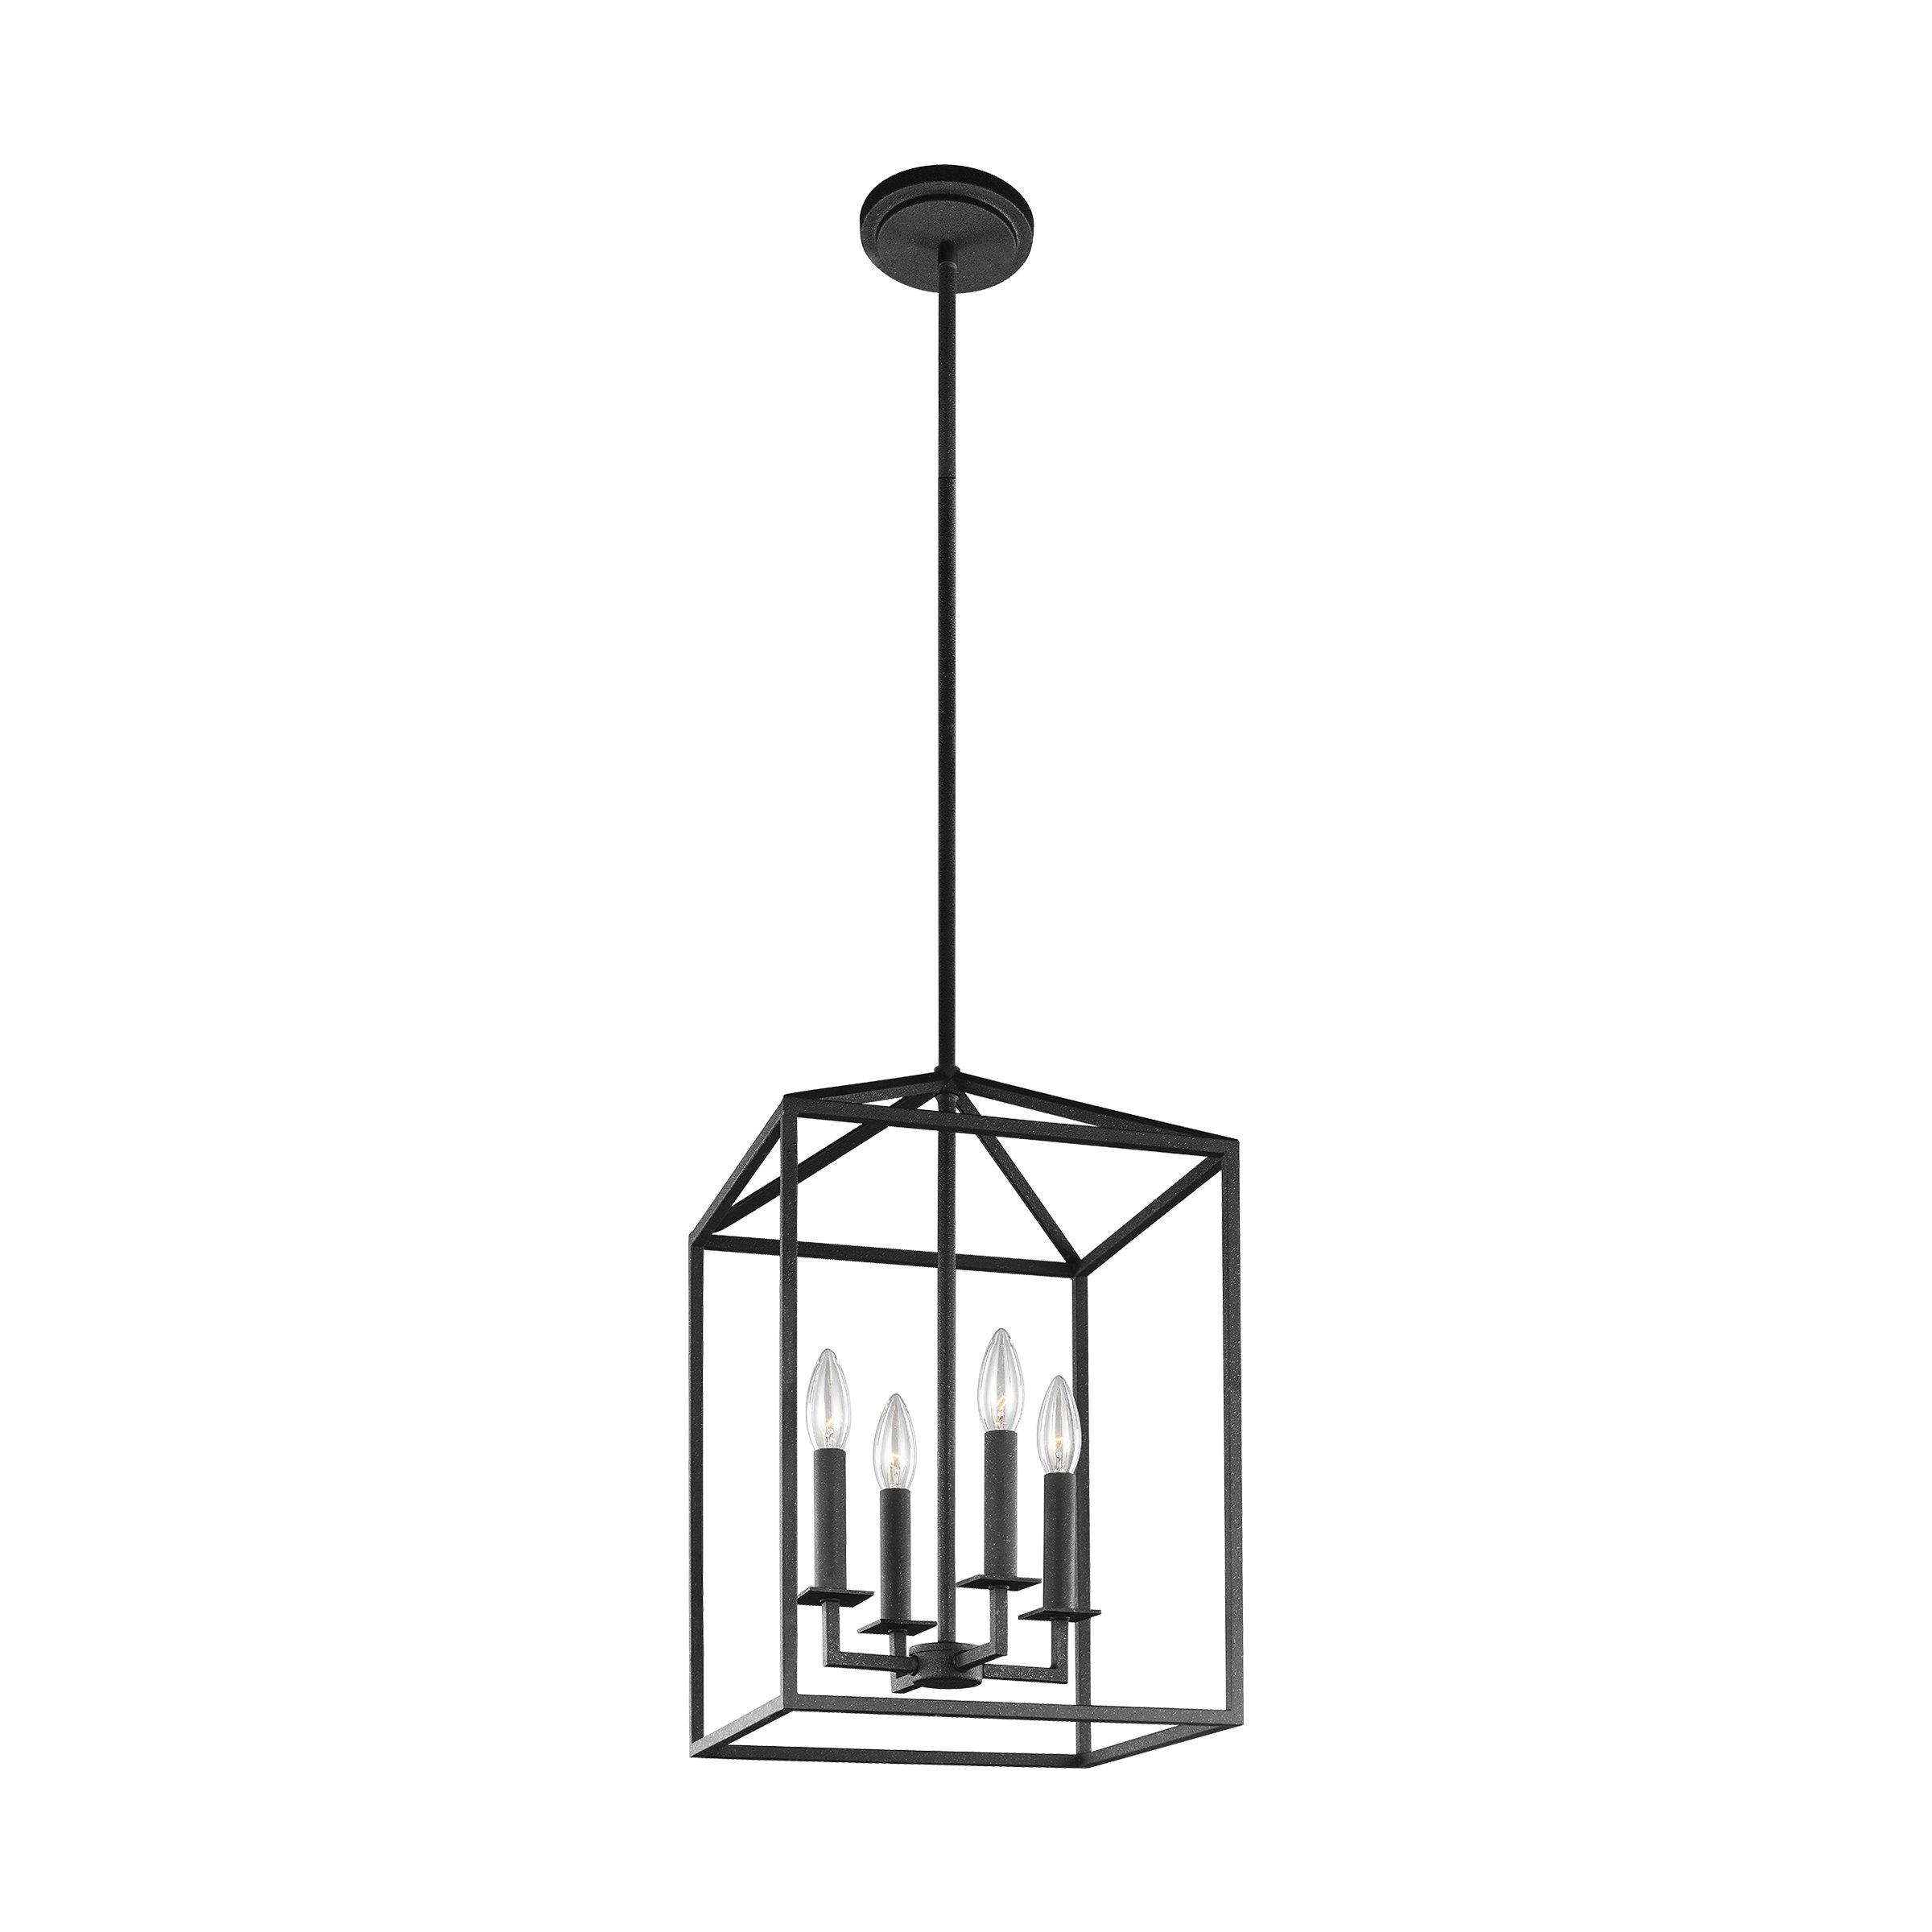 Odie 4 Light Lantern Square / Rectangle Pendant For 4 Light Lantern Square / Rectangle Pendants (View 12 of 30)